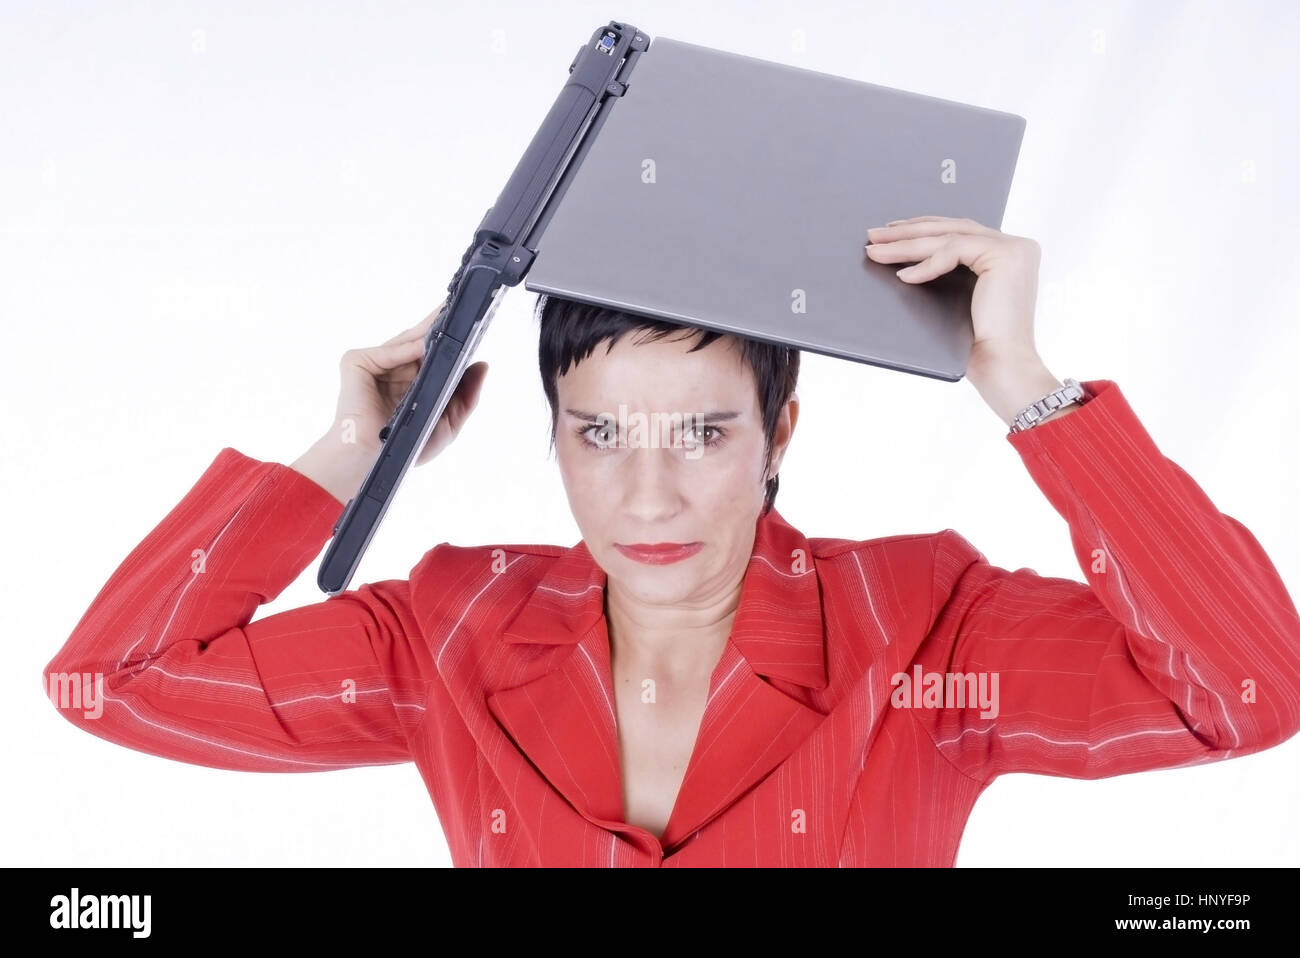 Model release , Veraergerte Businessfrau mit Laptop ueber dem Kopf - business woman with laptop Stock Photo